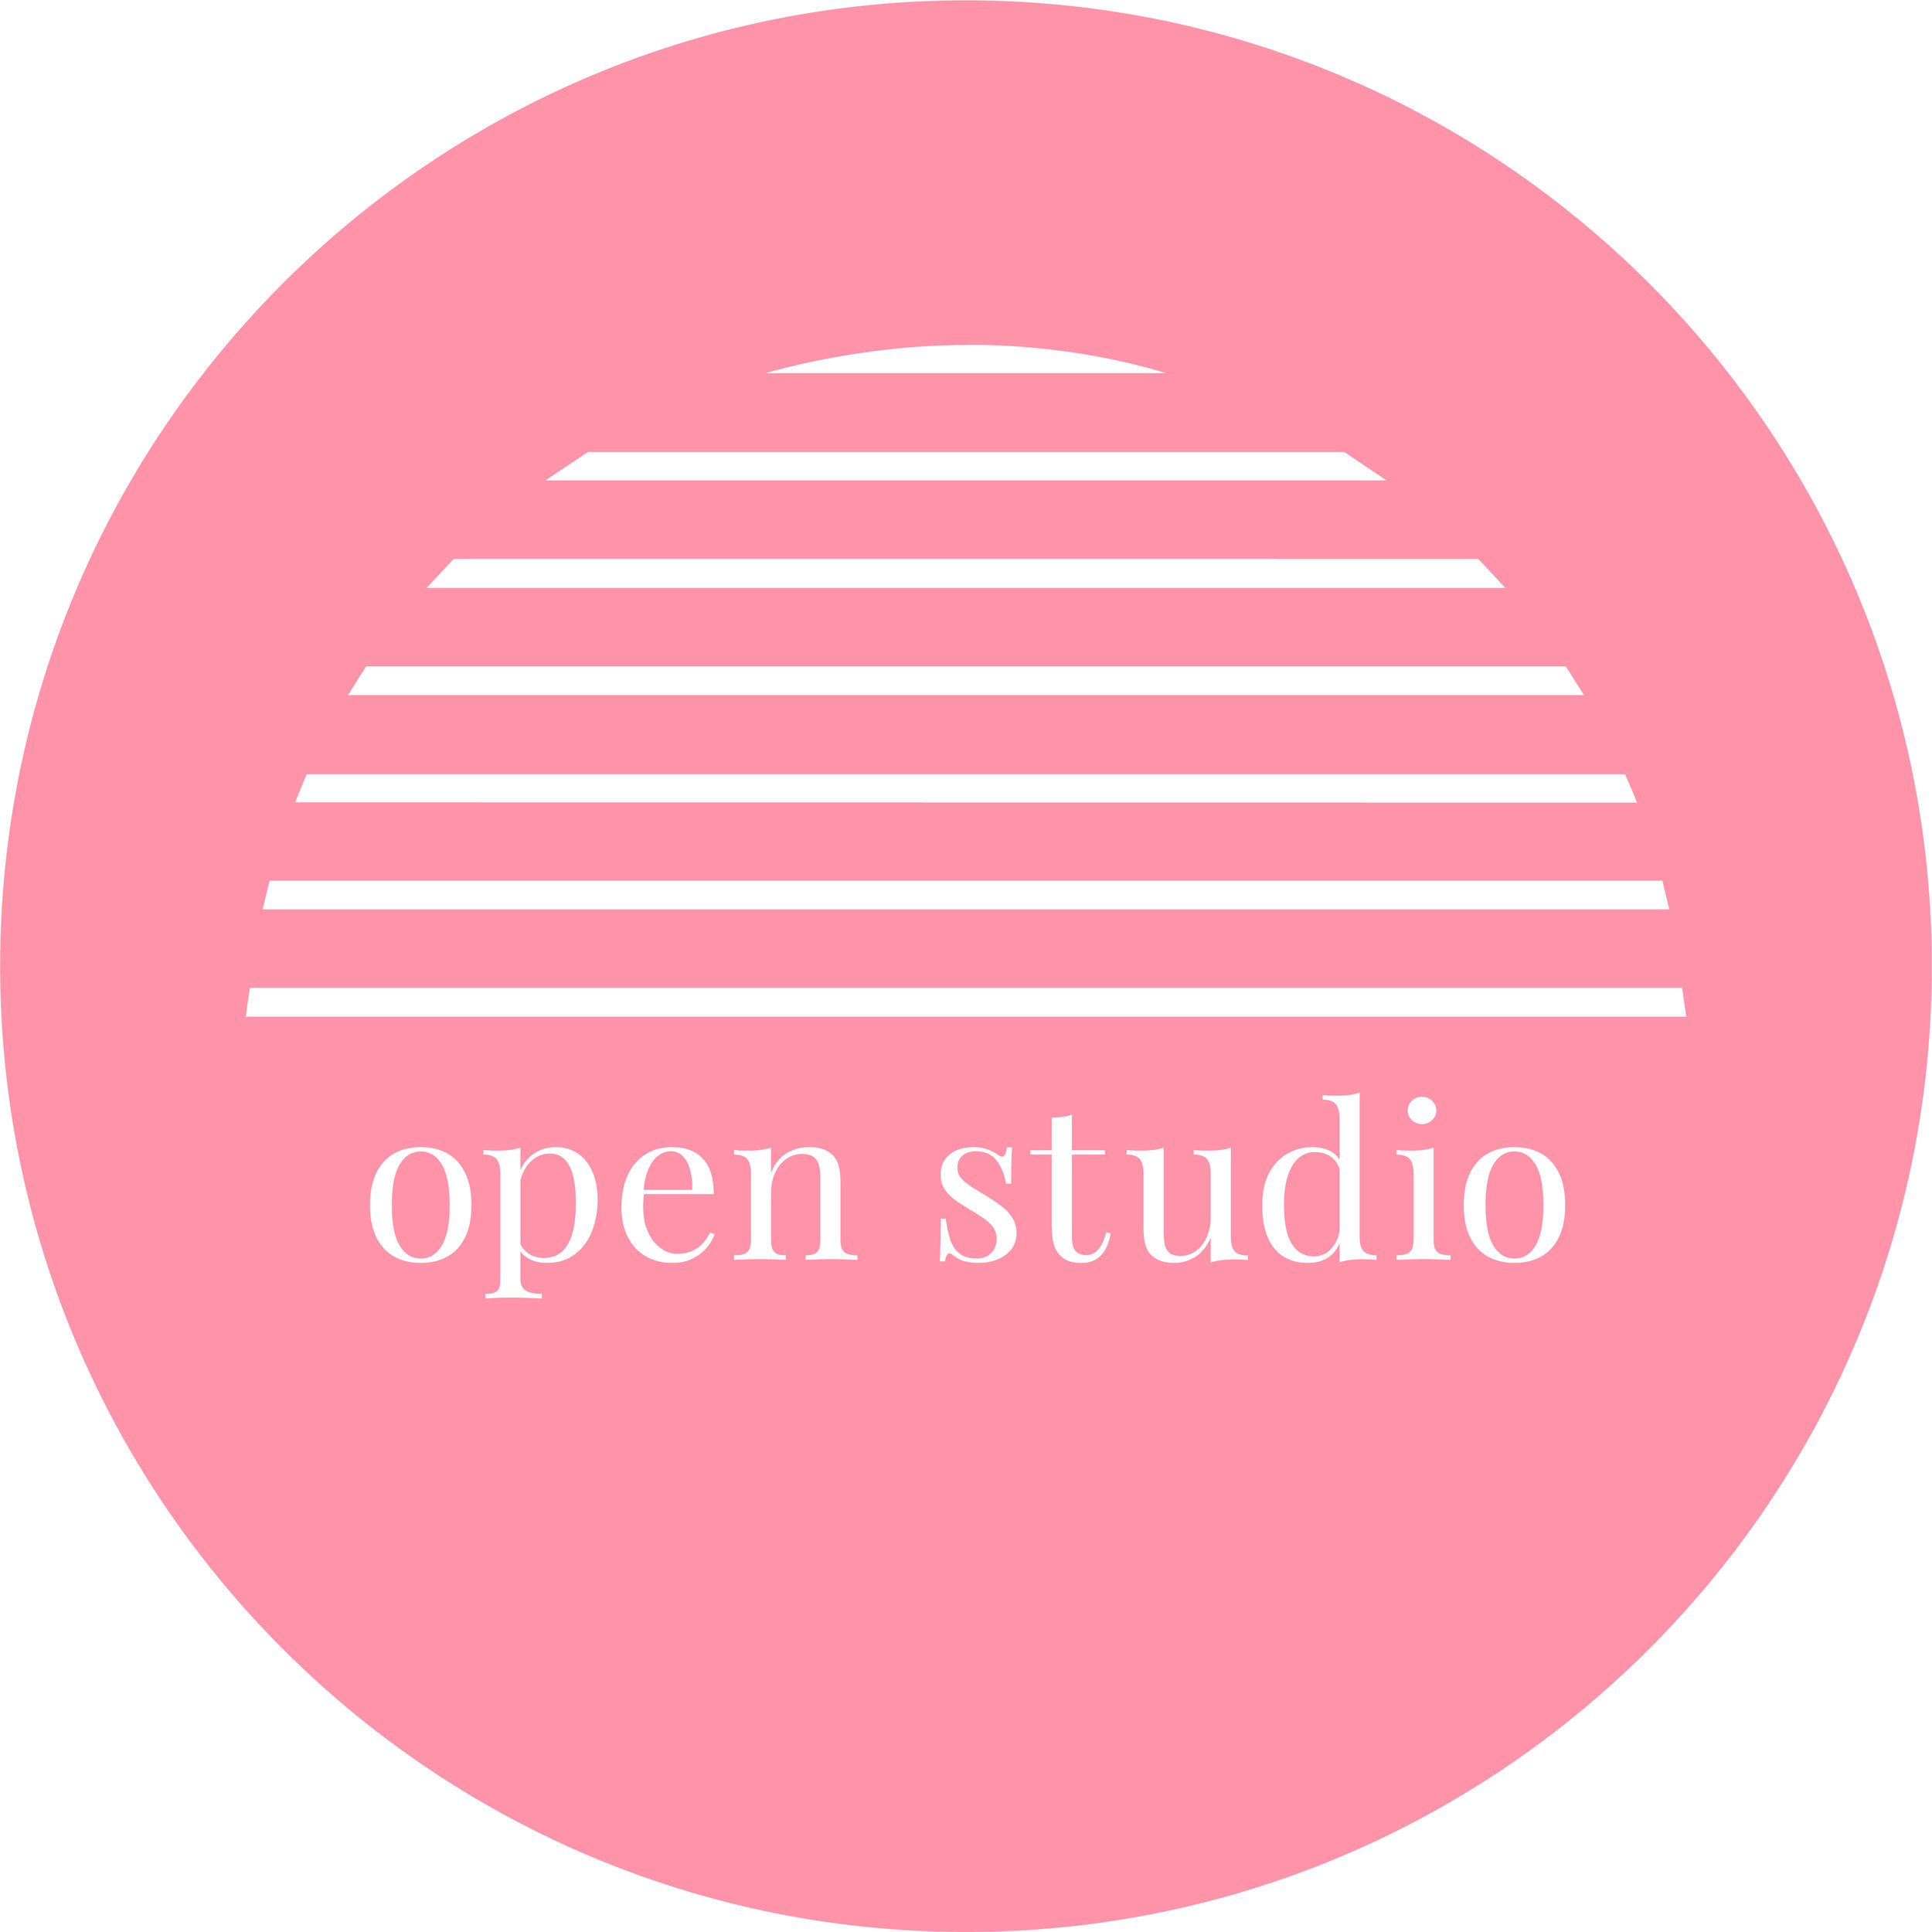 open studio logo_final_white in blush circle.jpg